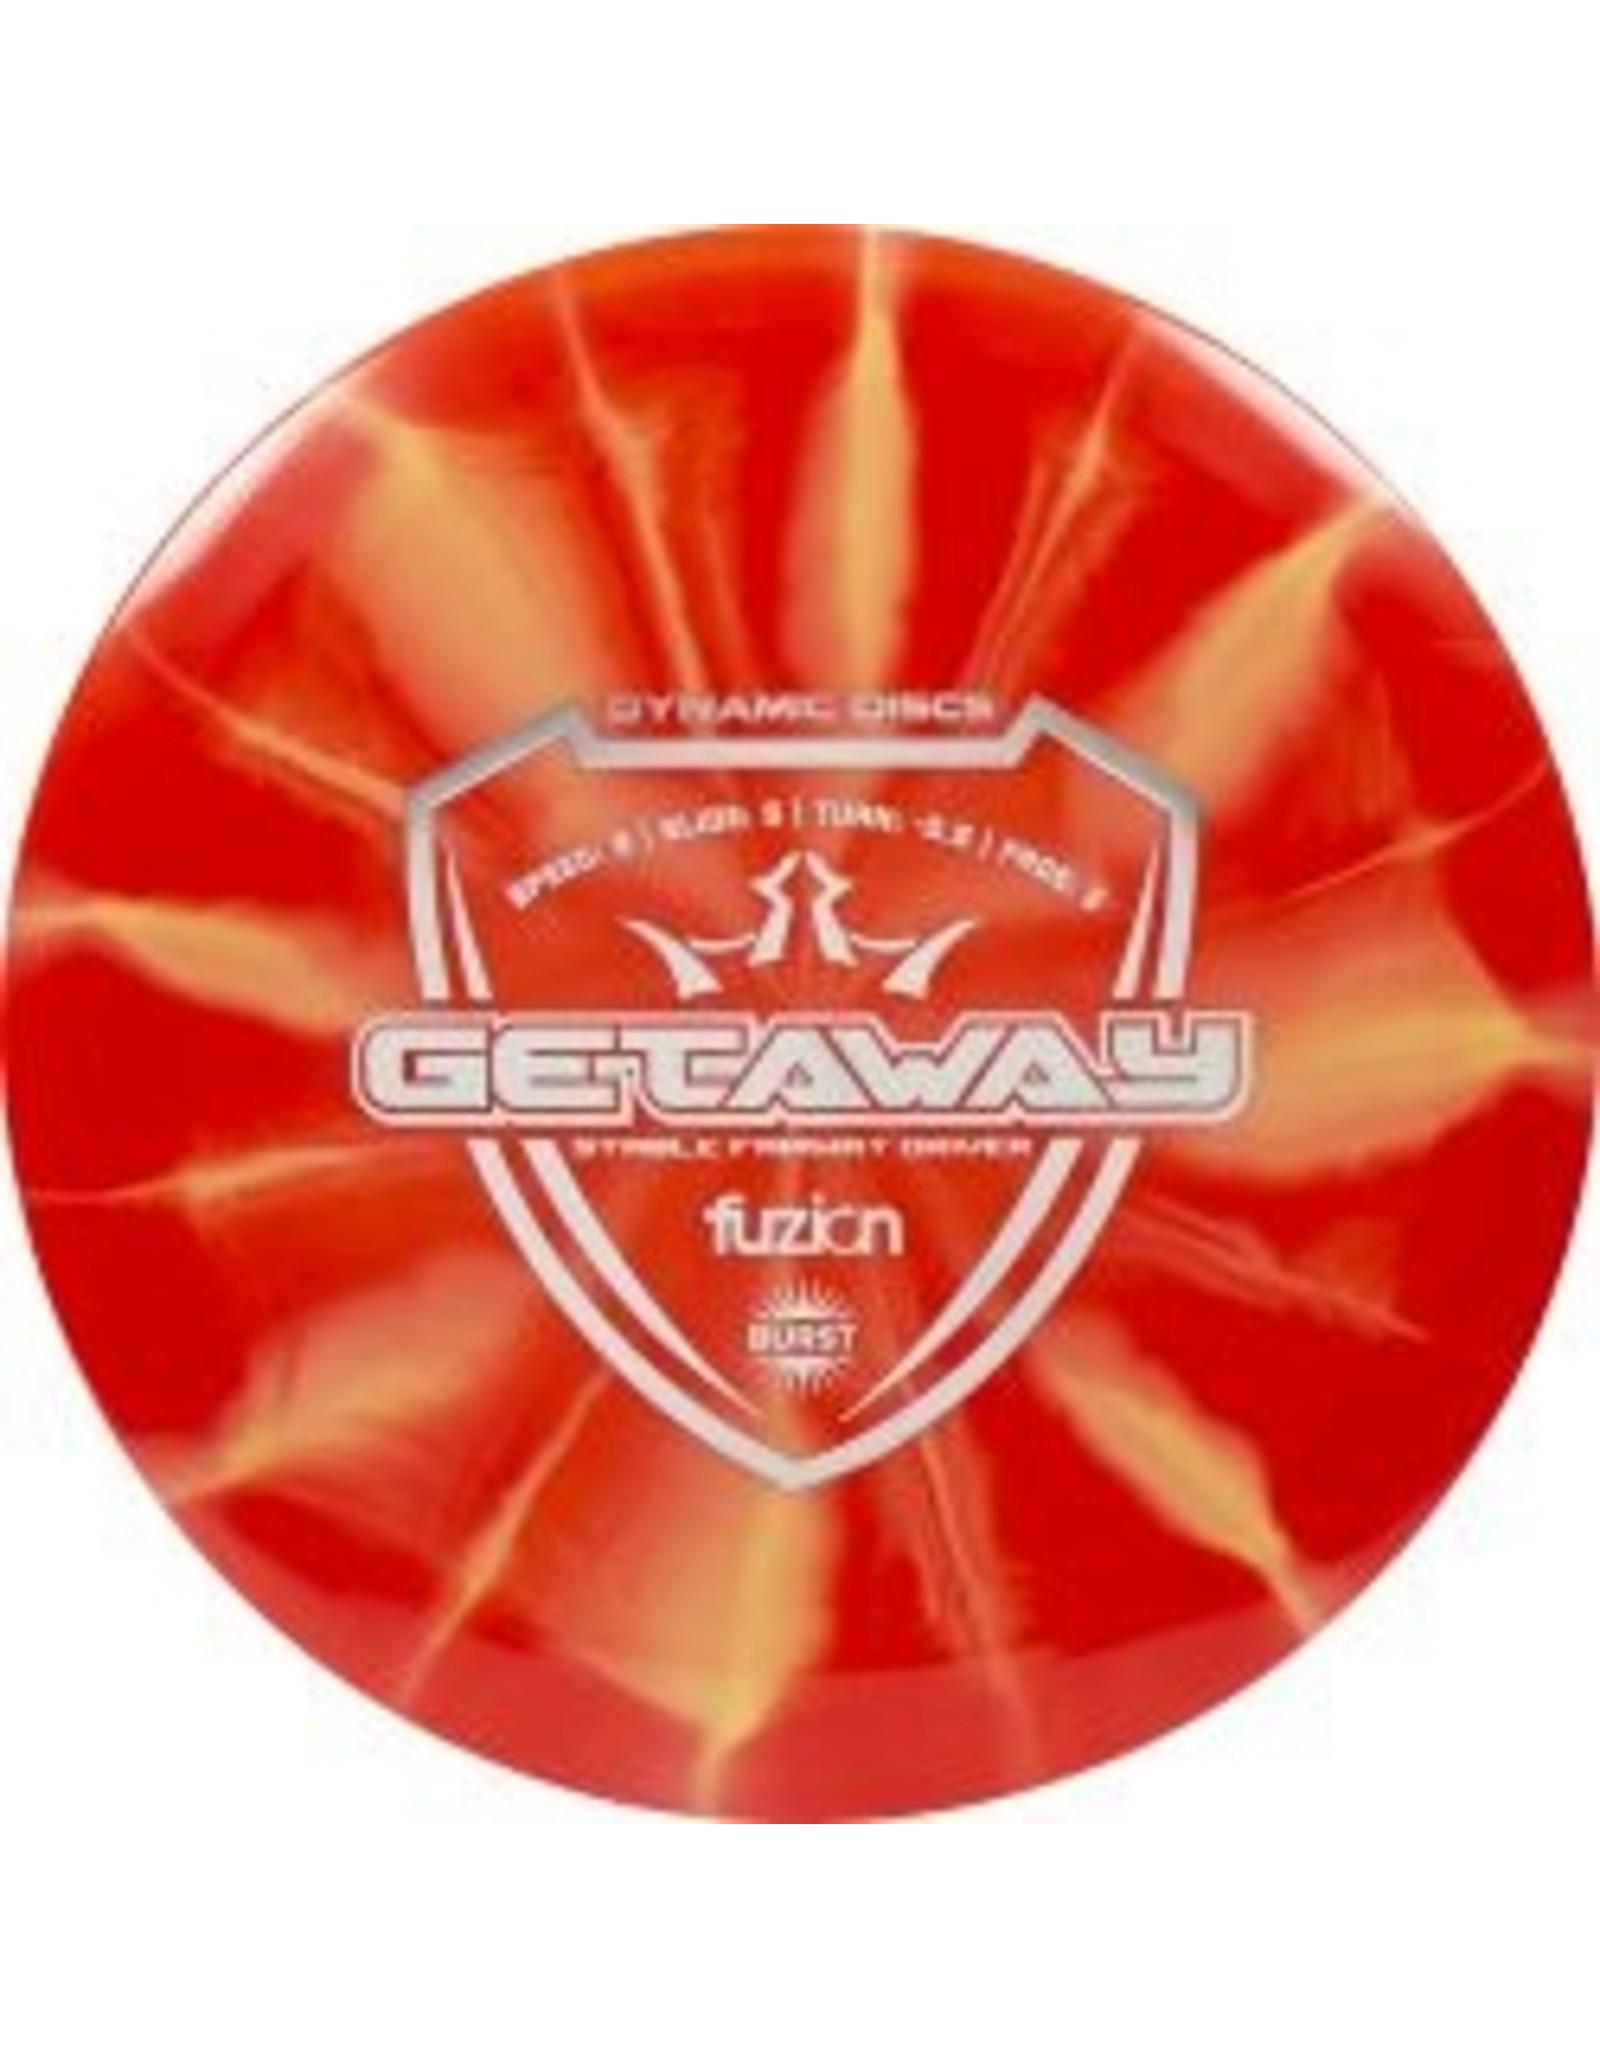 Dynamic Discs Fuzion Burst Getaway 170-172g